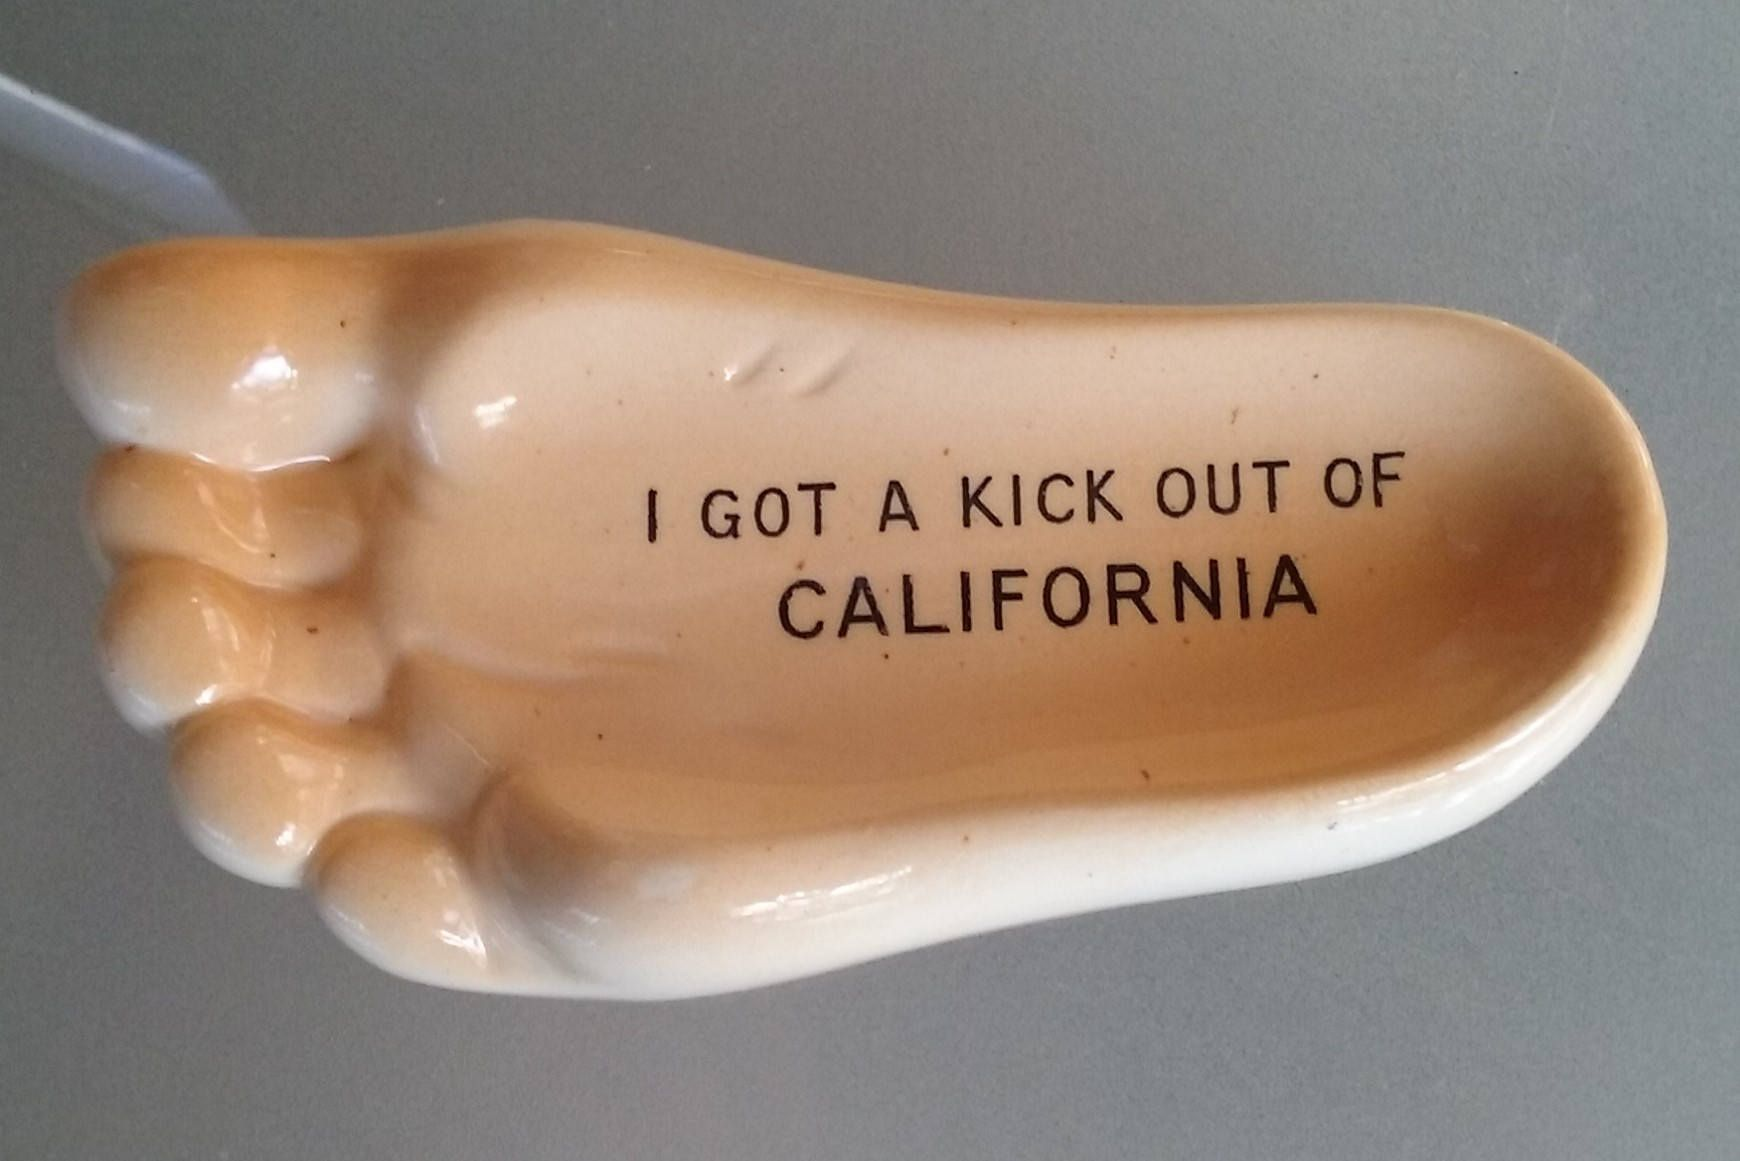 Anco Humorous Foot Ashtray, Vintage Home Decor, I Got a Kick Out of ...